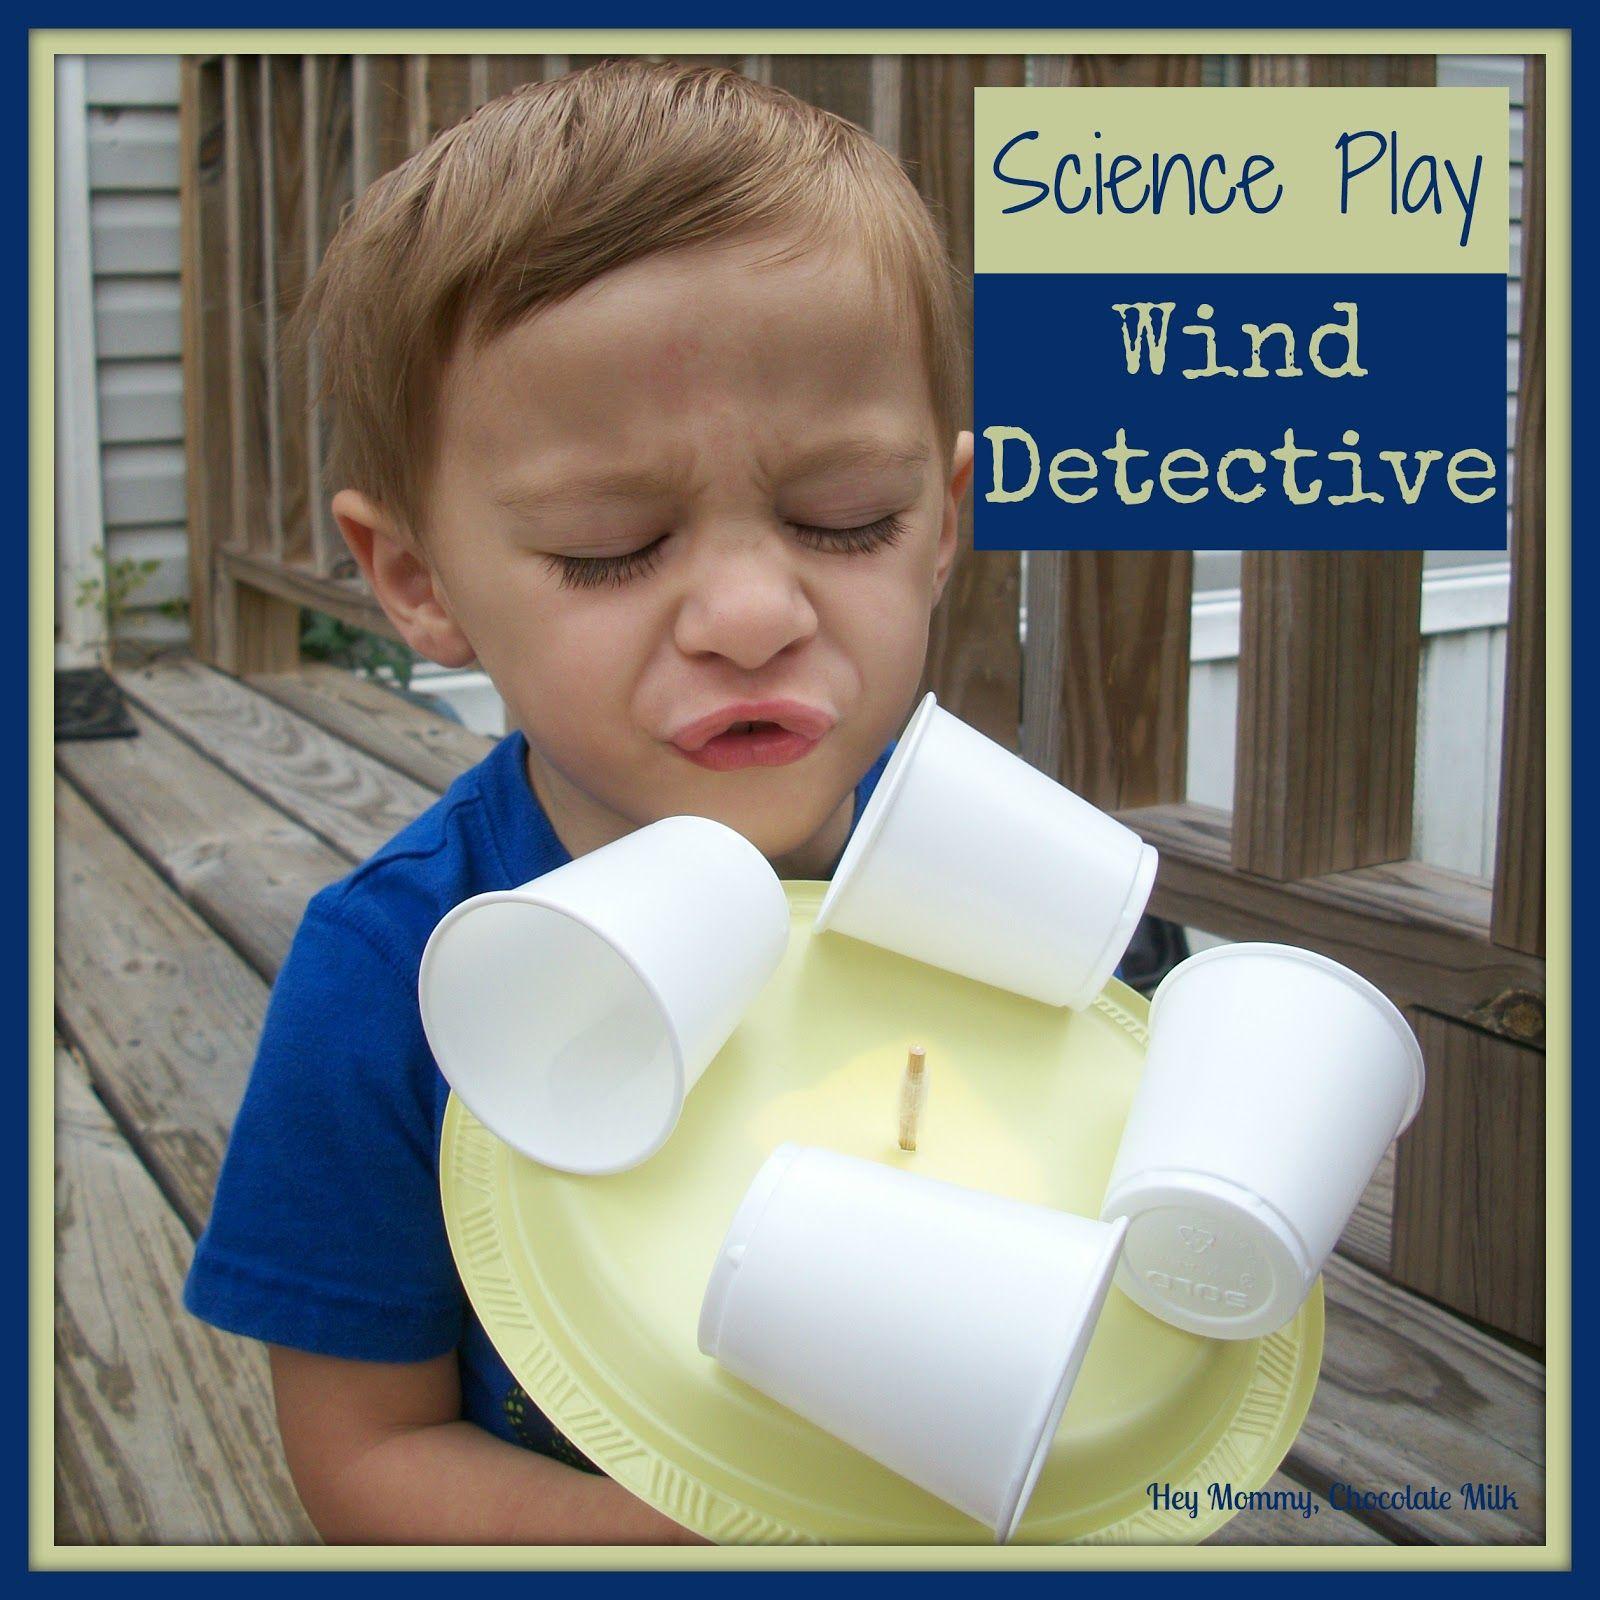 Wind Detective